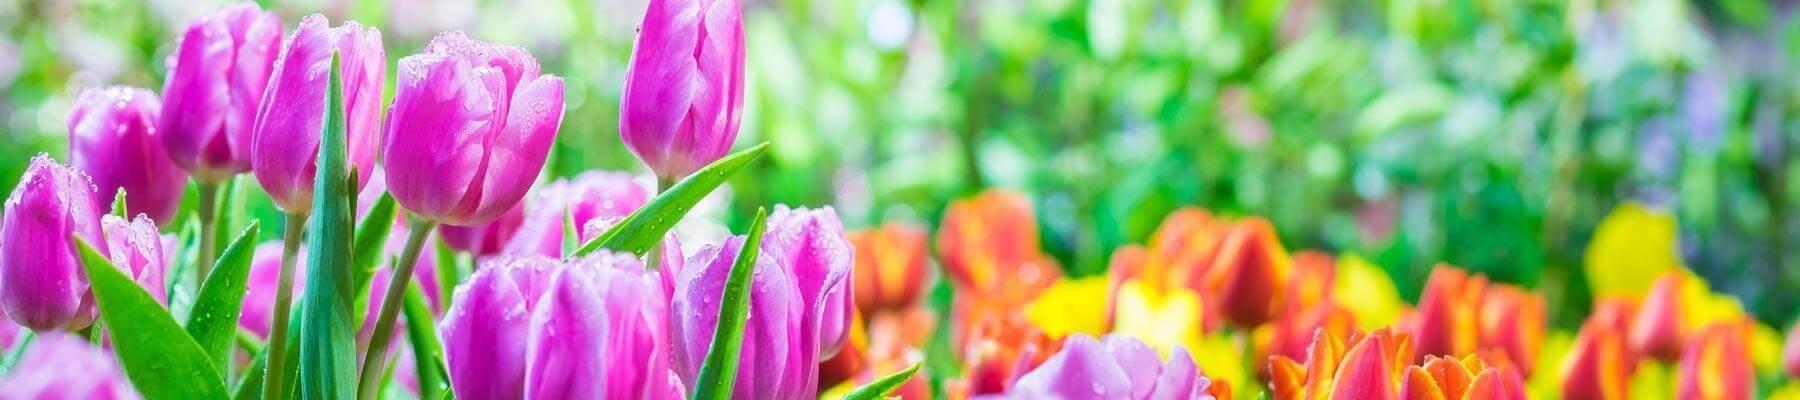 Vibrant Healthy Flowers